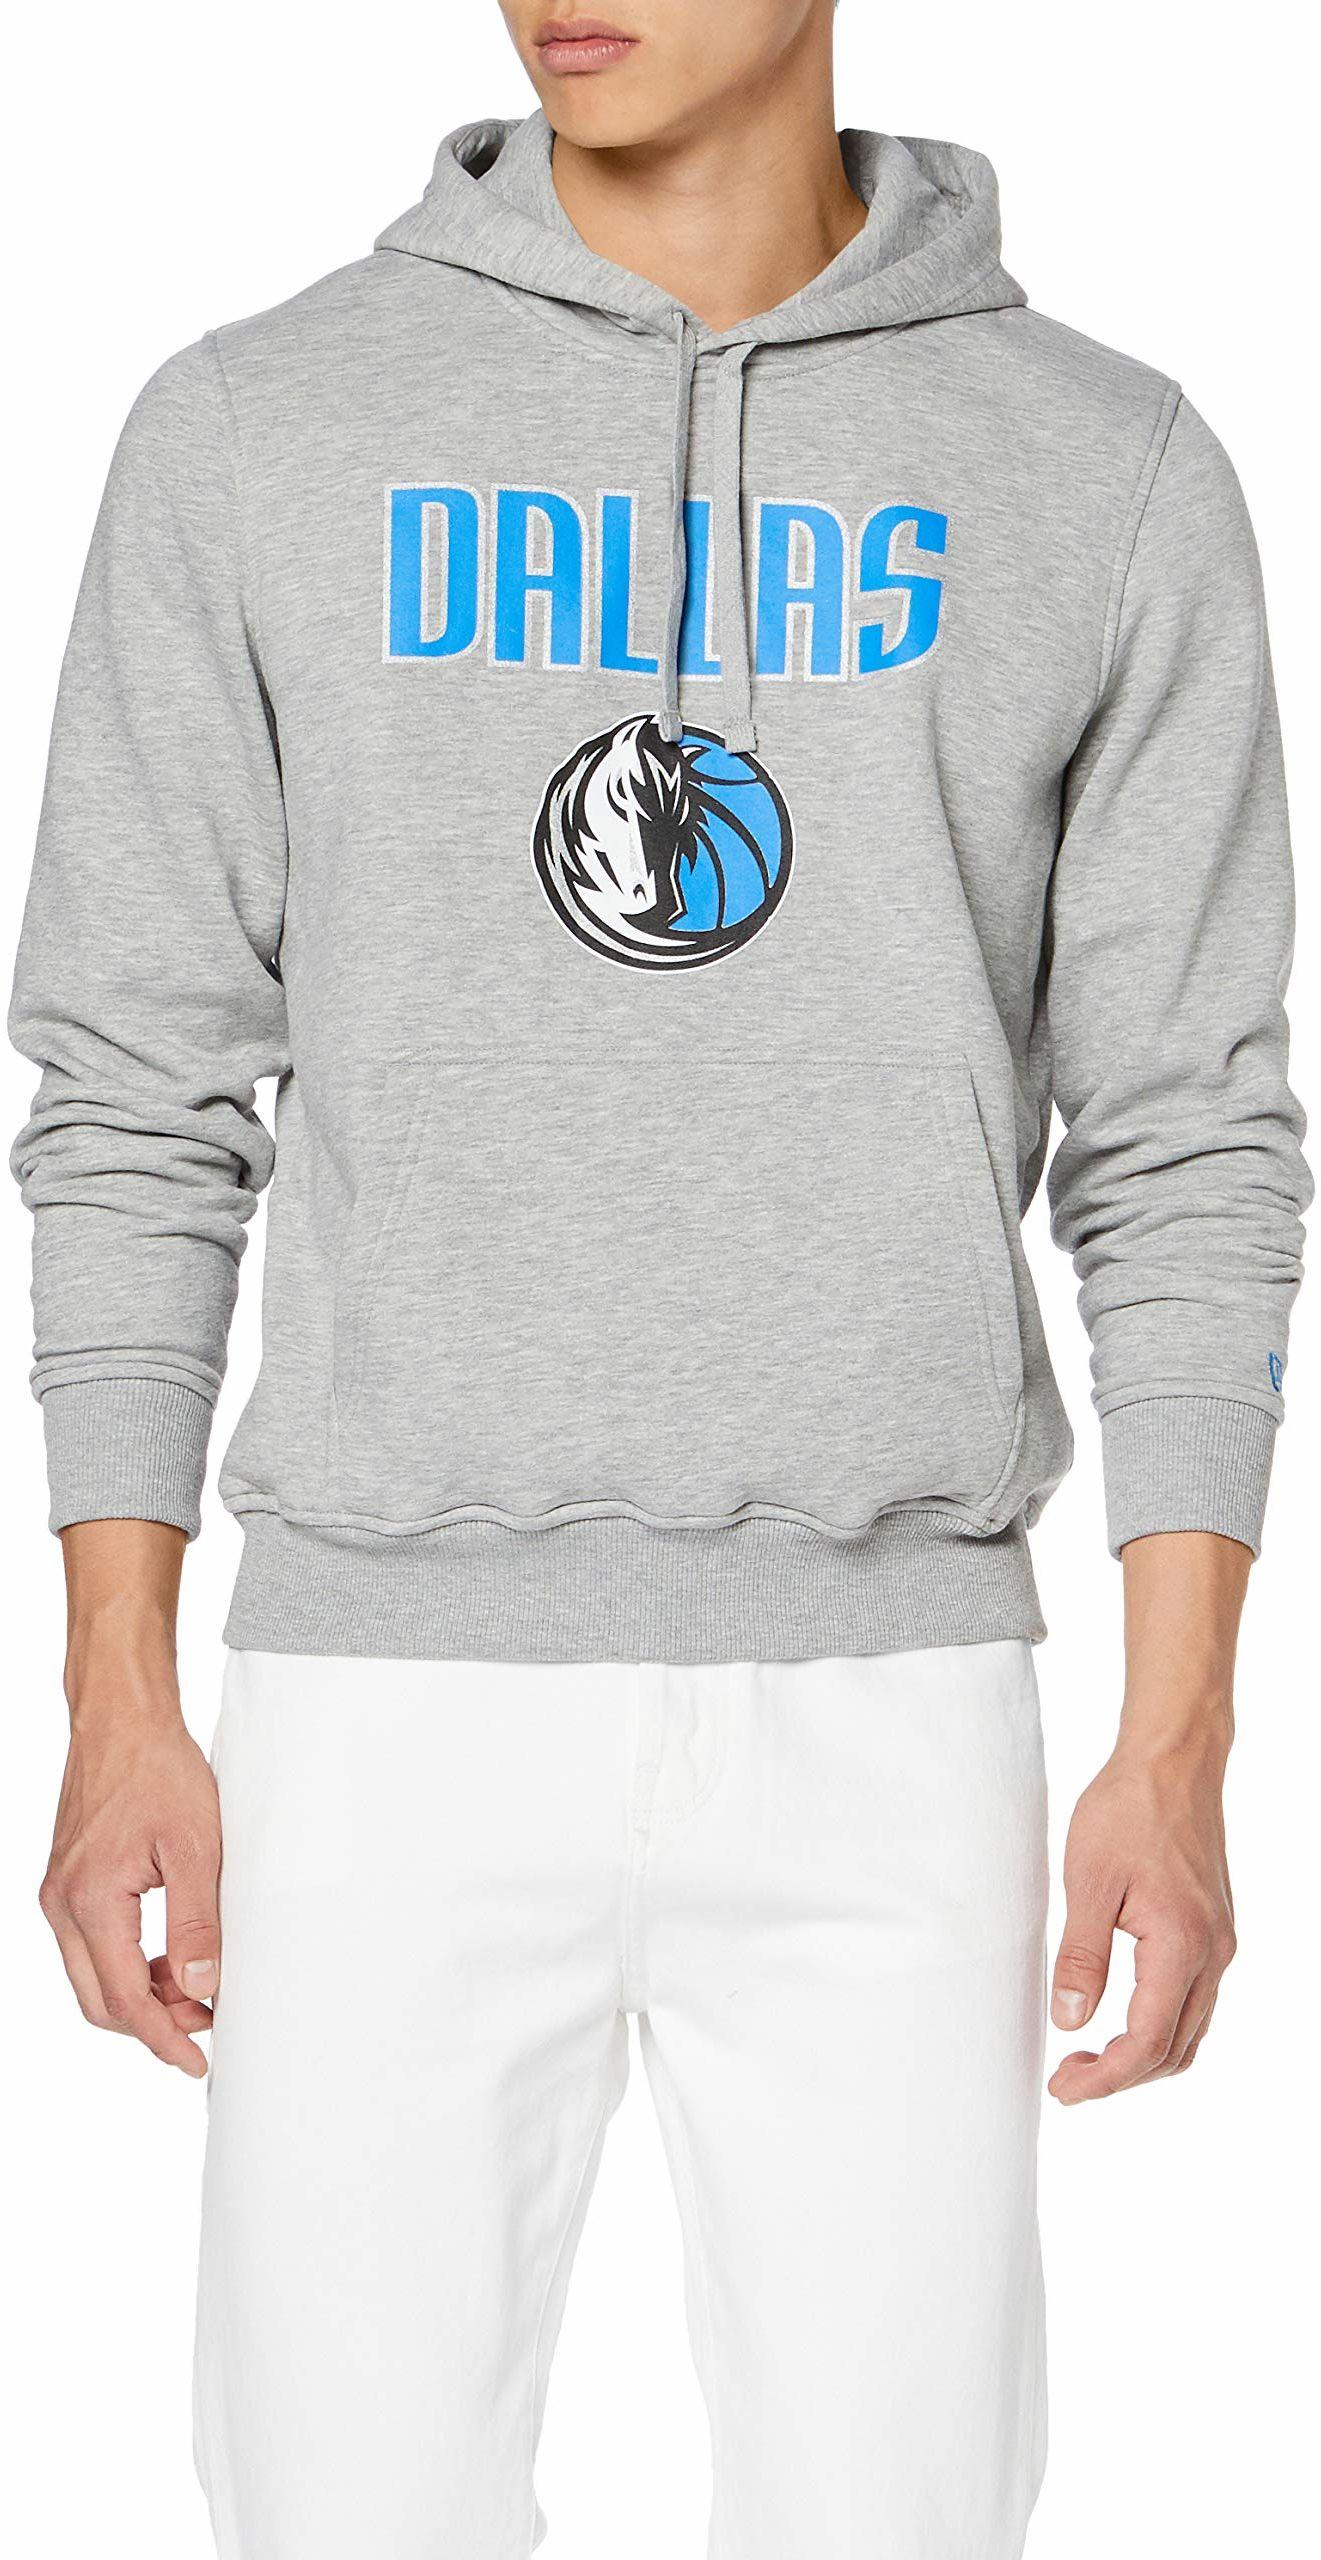 New Era Męski sweter z kapturem Boston Celtics, szary, rozmiar XL, 11546182